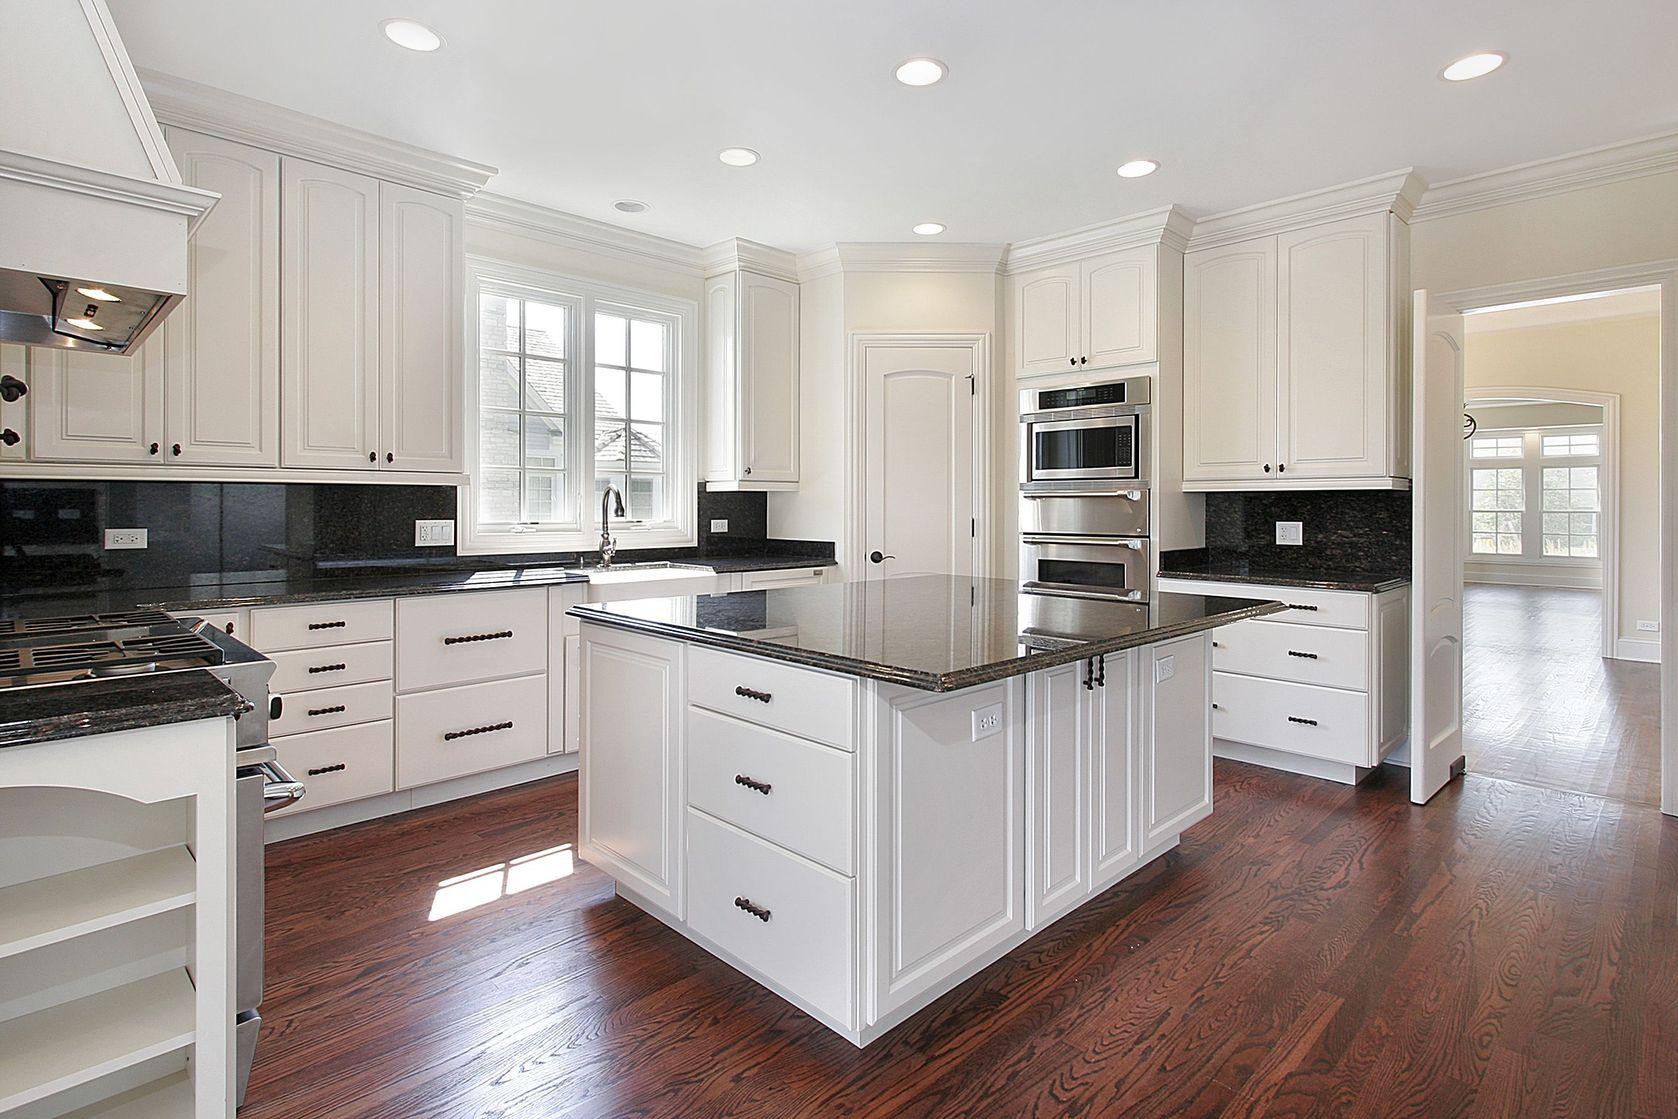 Refinish Kitchen Cabinets Contractors Beautiful Refinishing White Kitchen Cabinets YUF17 – Cold Spring